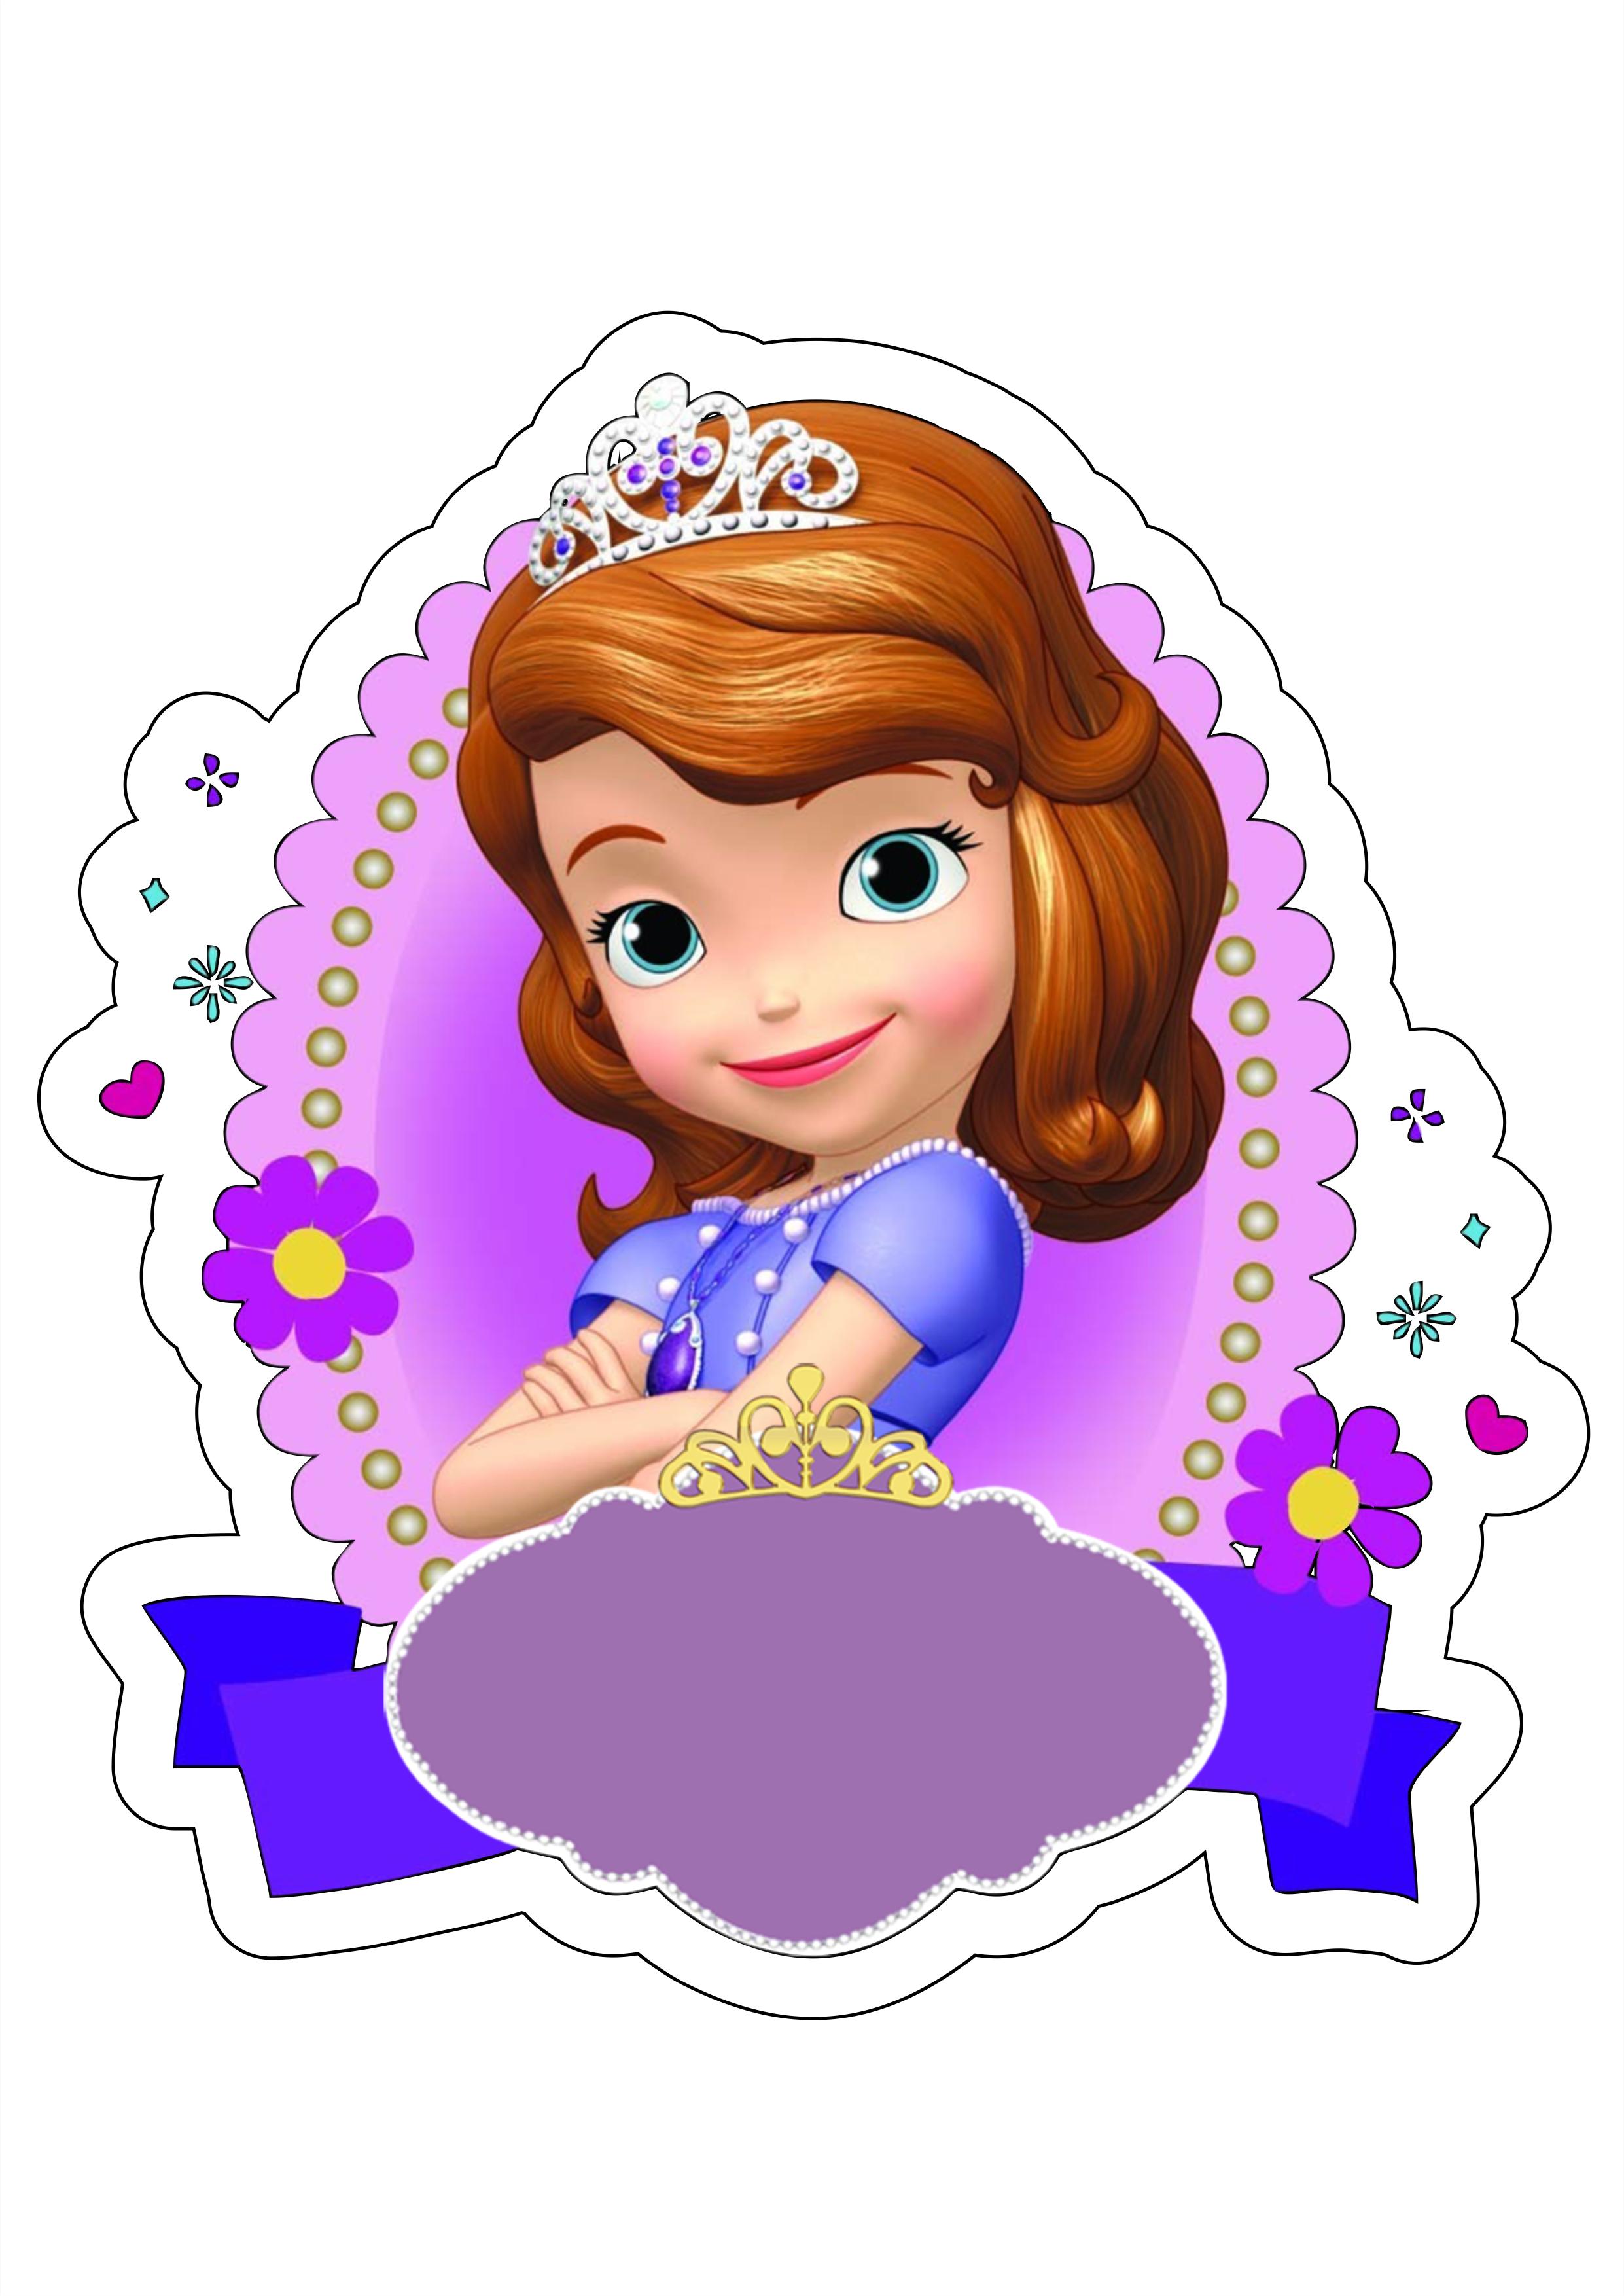 Princesa Sophia Princess Sofia Party Princess Sofia Birthday Party Ideas Sofia Party